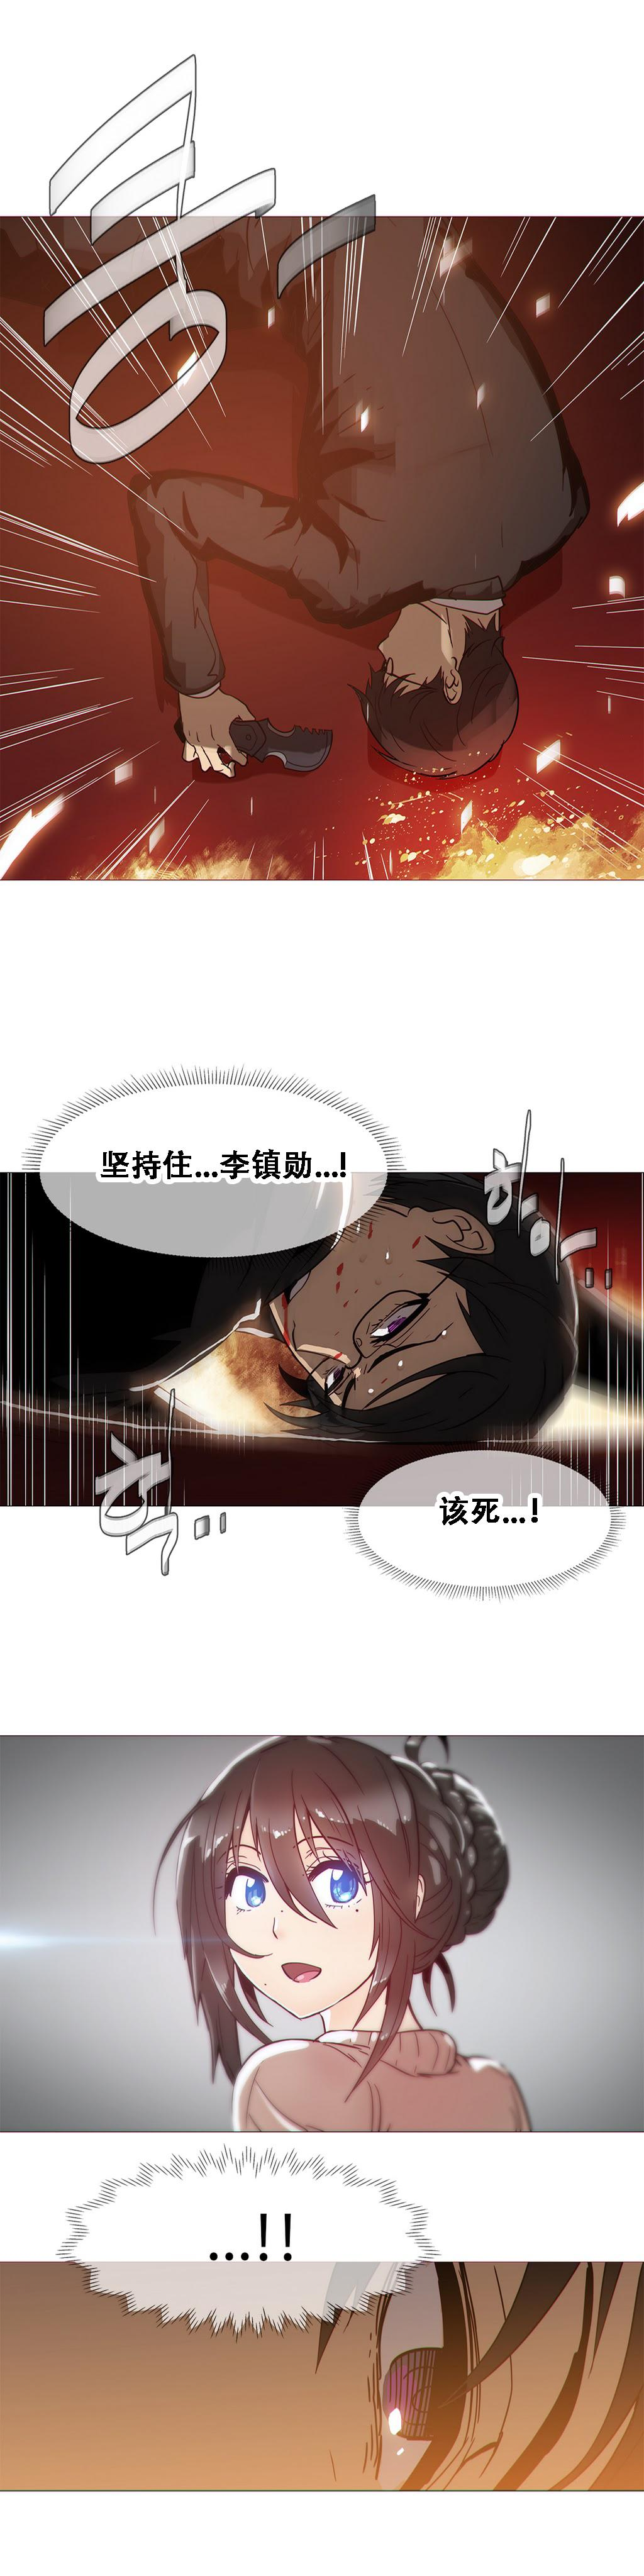 HouseHold Affairs 【卞赤鲤个人汉化】1~21话(持续更新中) 399